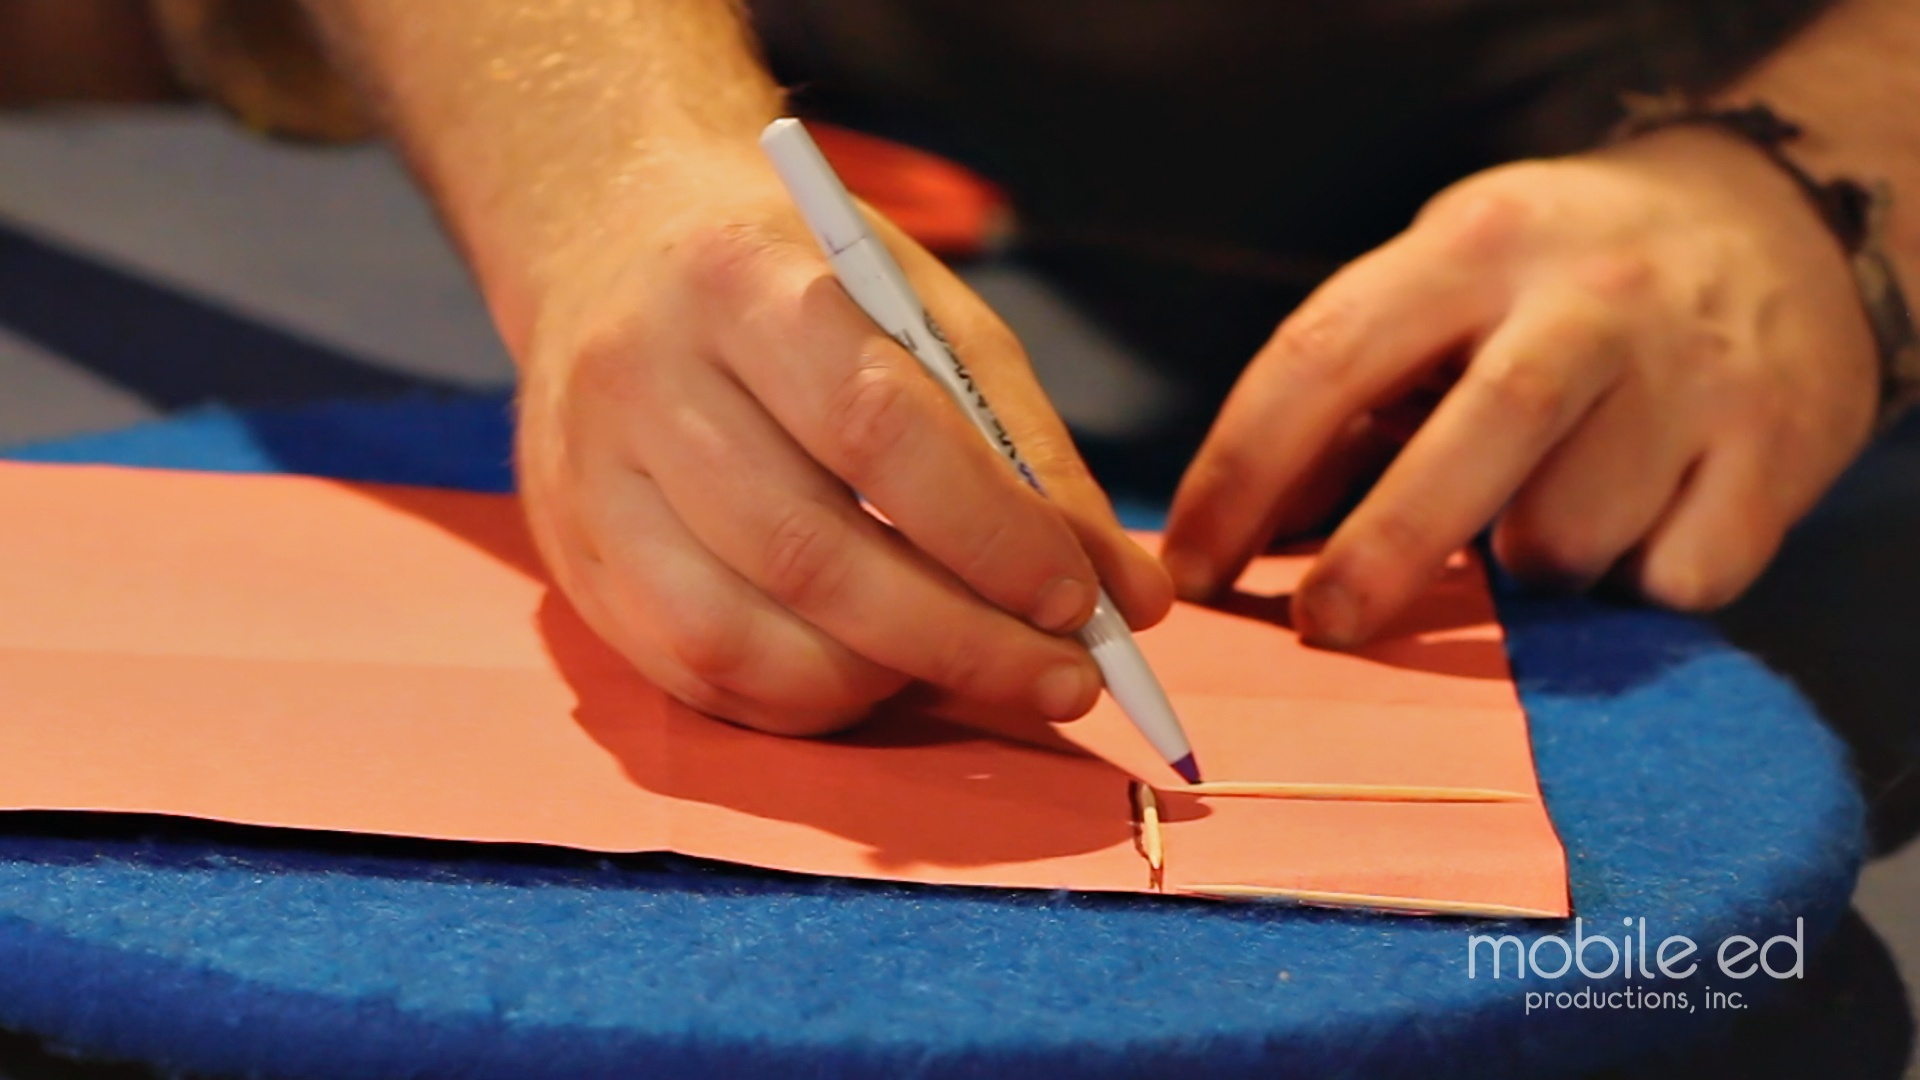 Measure a perfect square | Handy Dan the Junkyard Man | Mobile Ed Productions